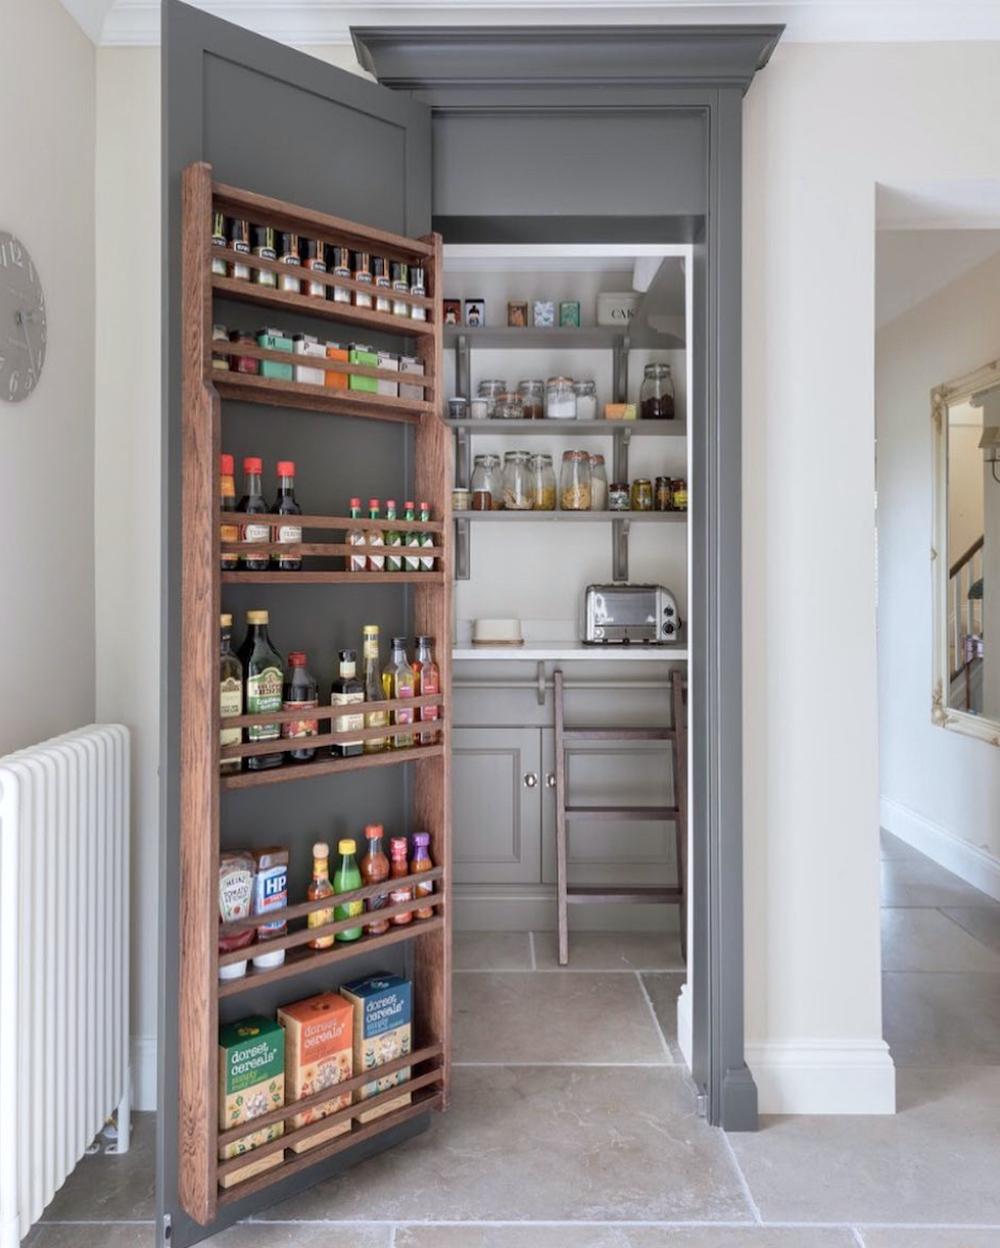 Walk in pantry designed by Humphrey Munson || First Sense kitchen renovation inspiration